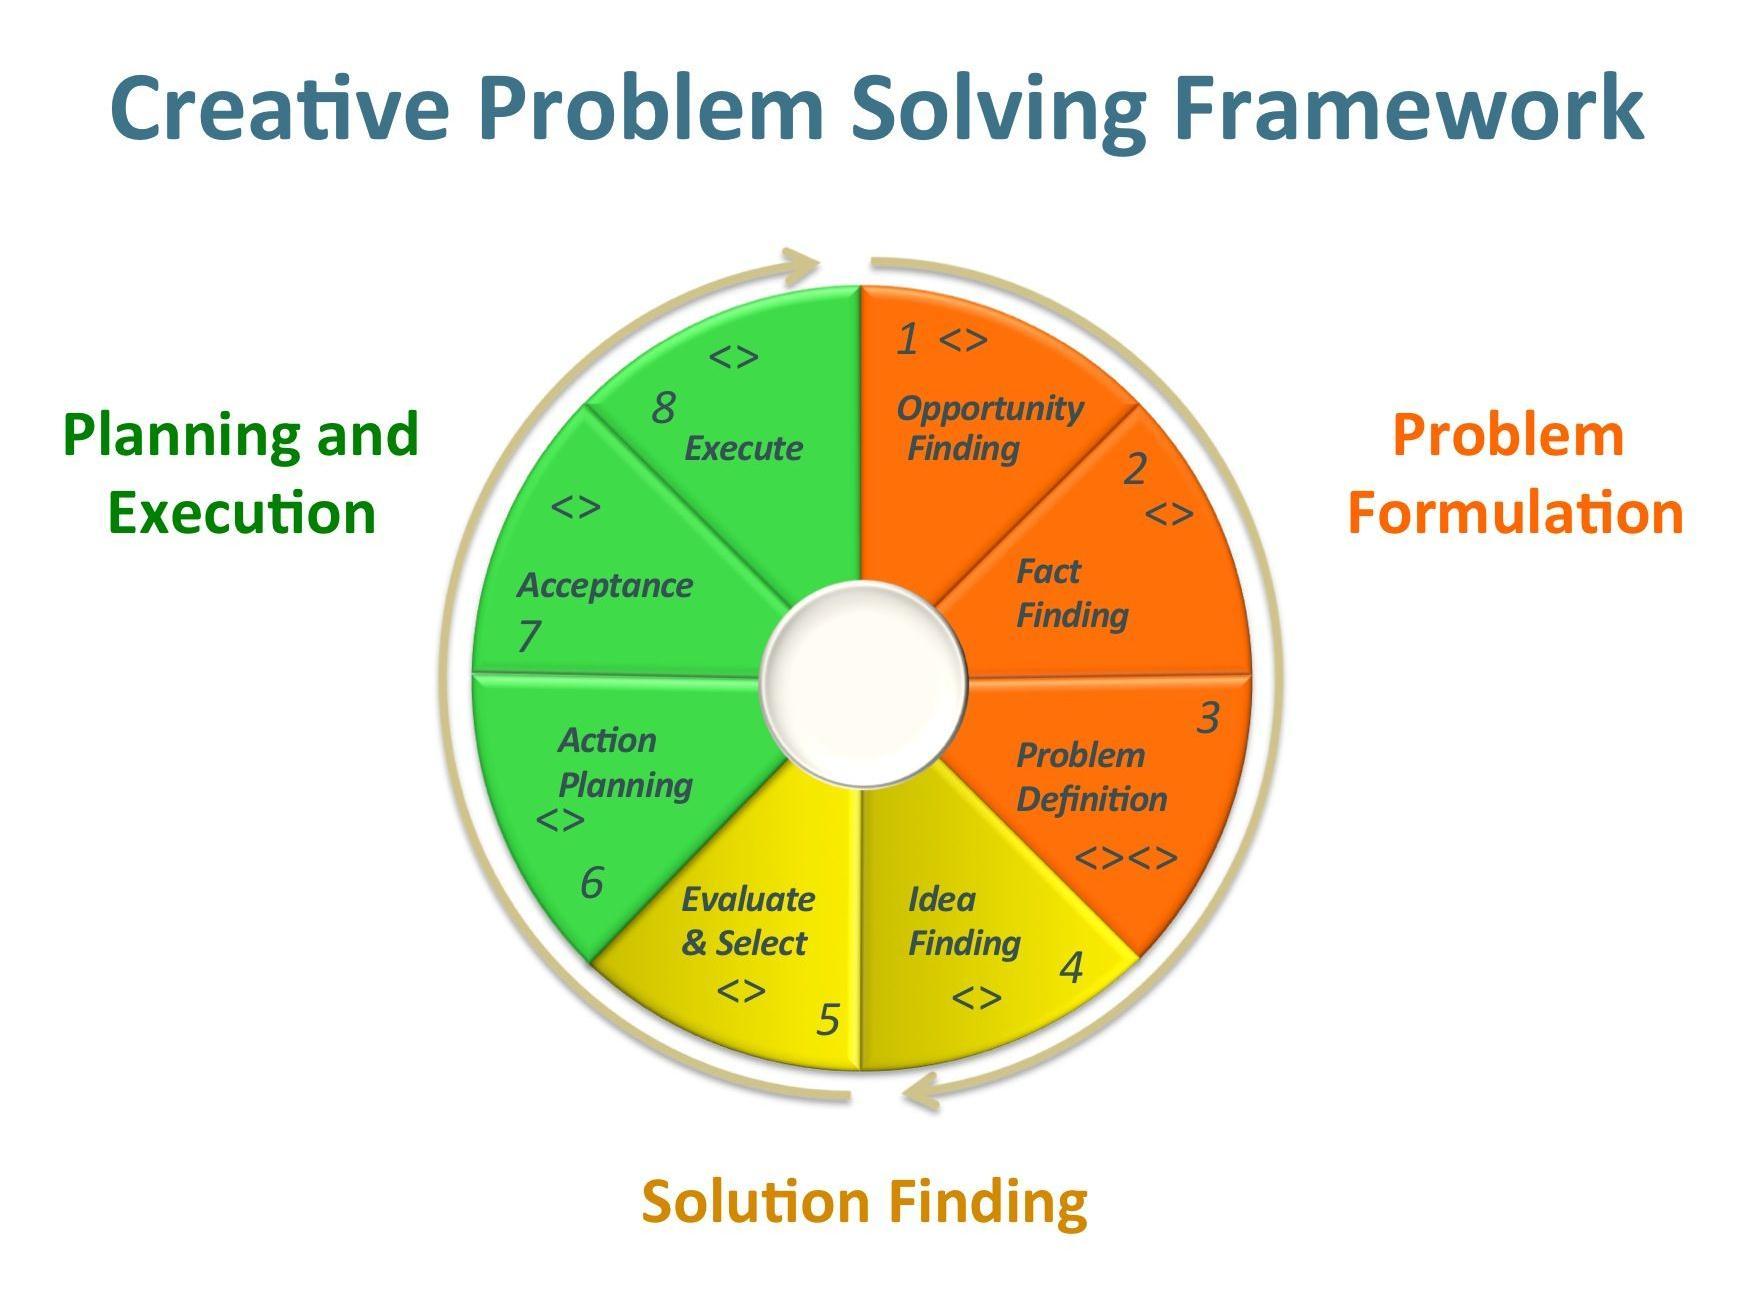 Creative Problem Solving Framework